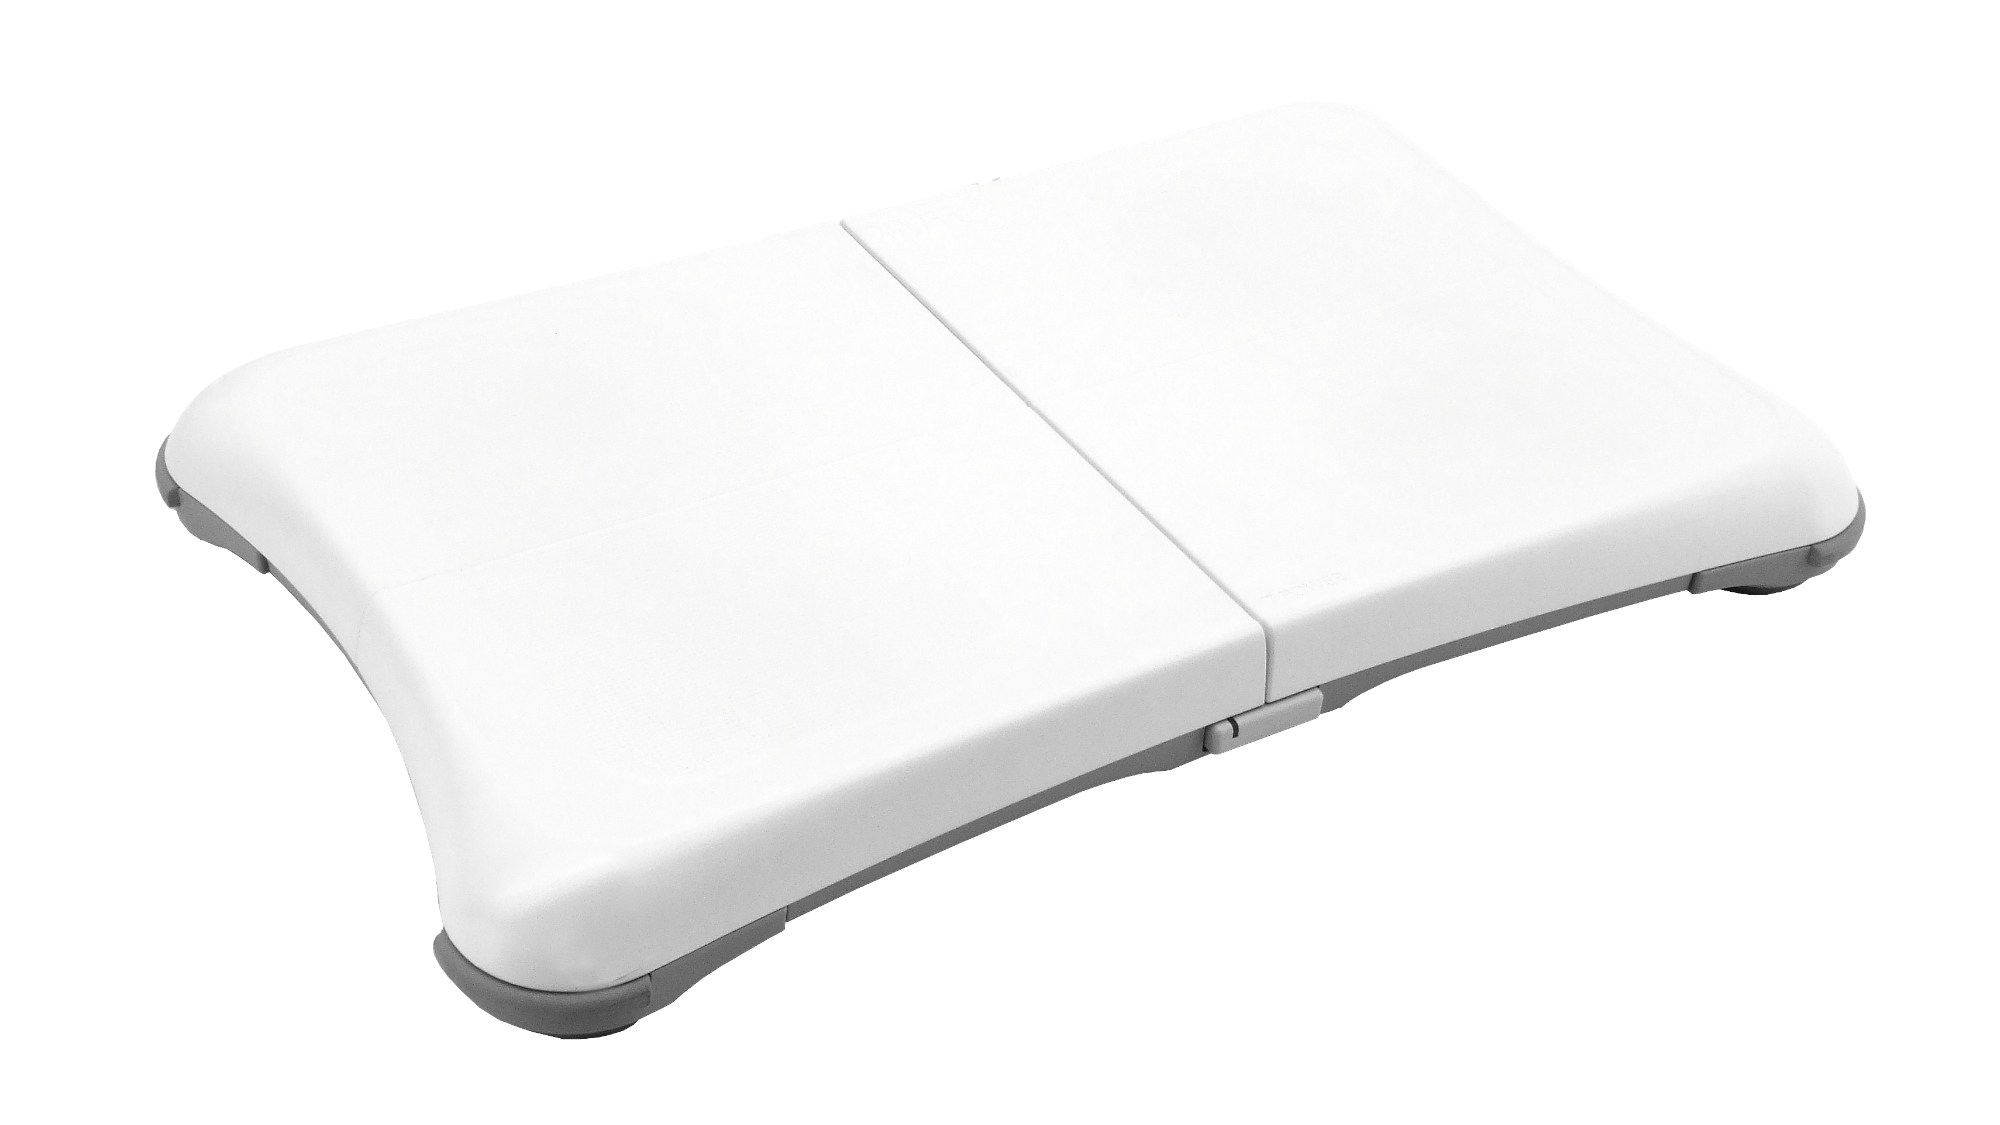 Wii Fit Plus Balance Board leihen